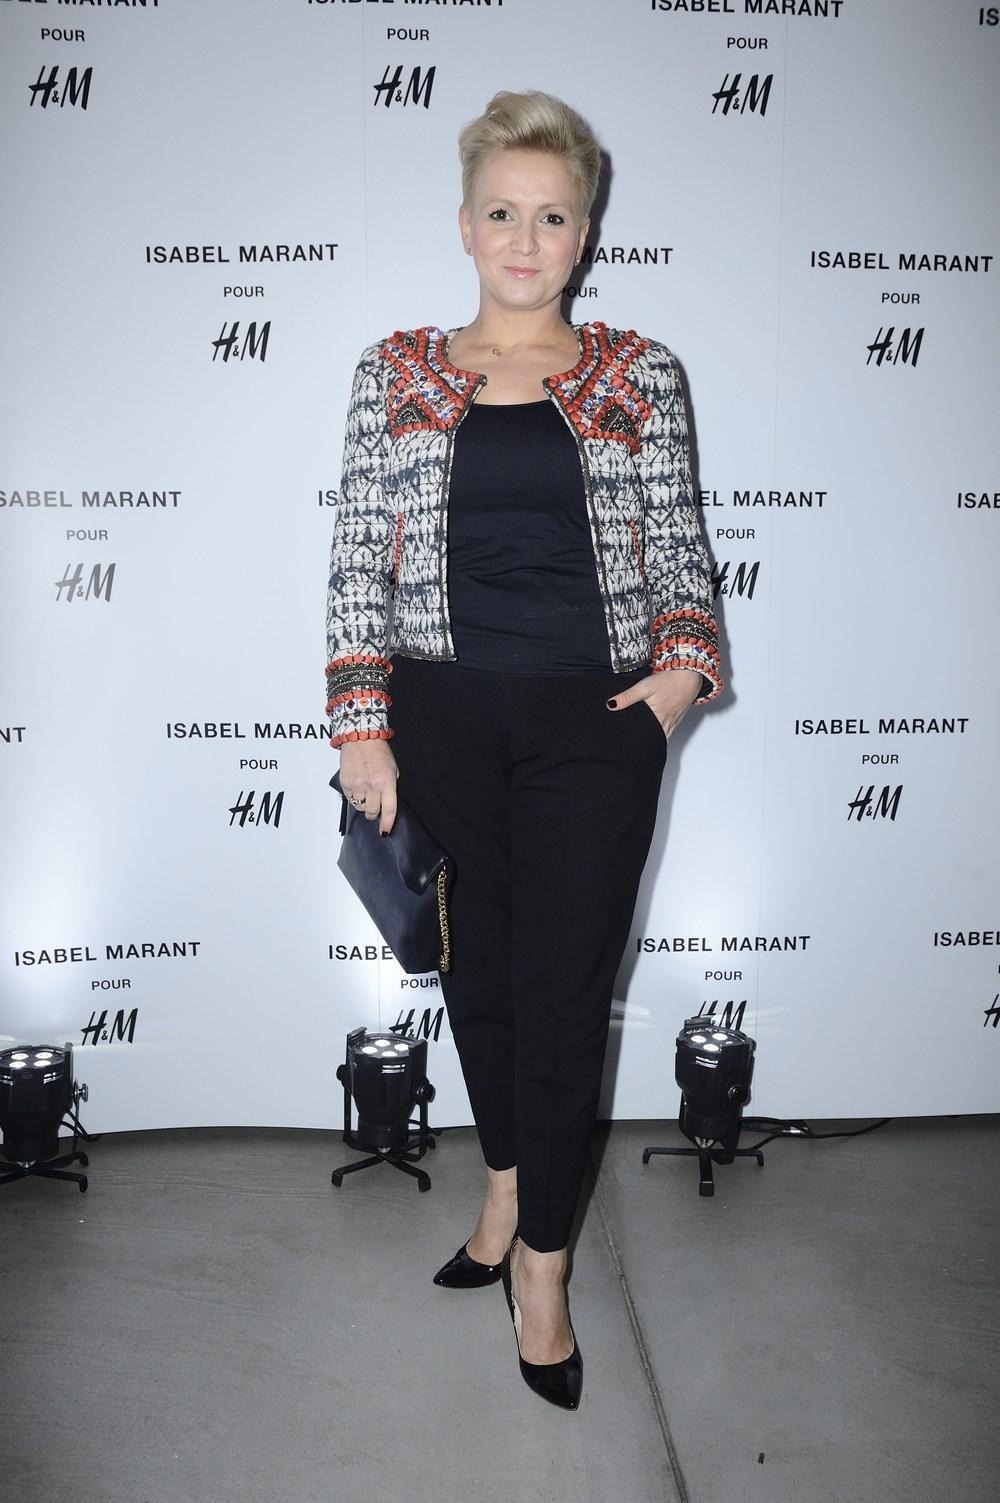 1619961fb3e36 Premiera kolekcji Isabel Marant dla H&M - Premiera kolekcji Isabel ...